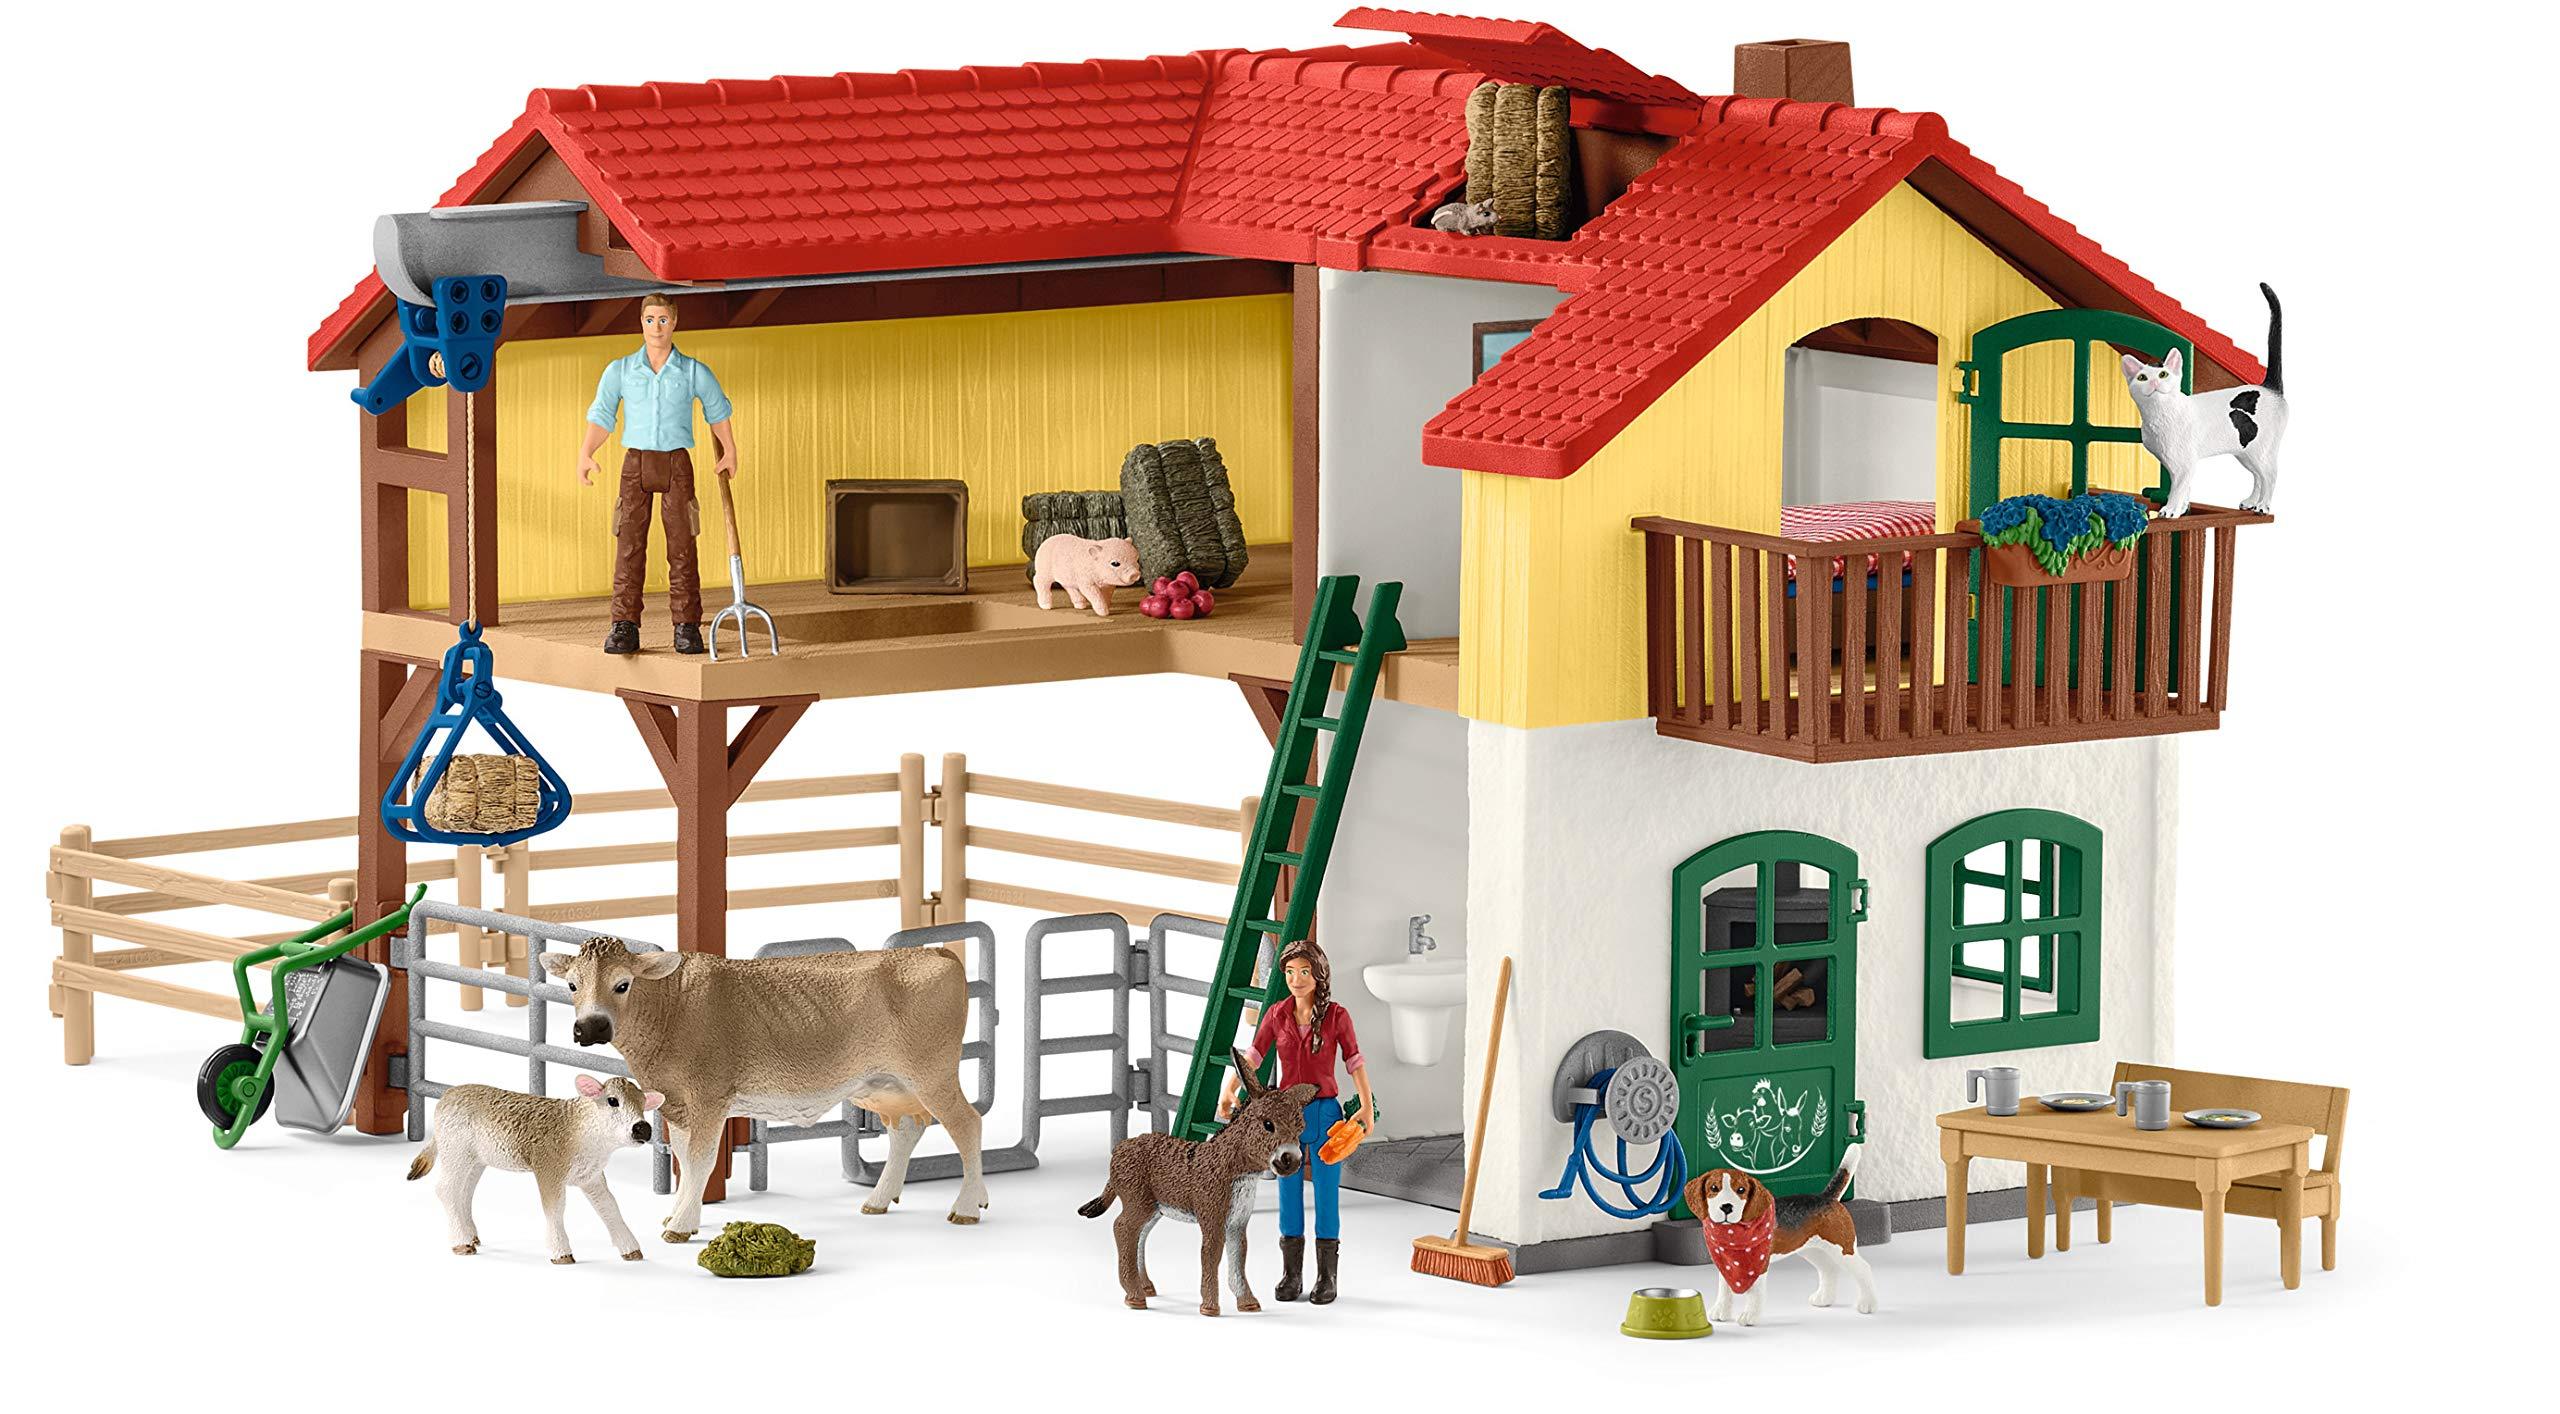 Schleich Large Farm House by Schleich (Image #1)